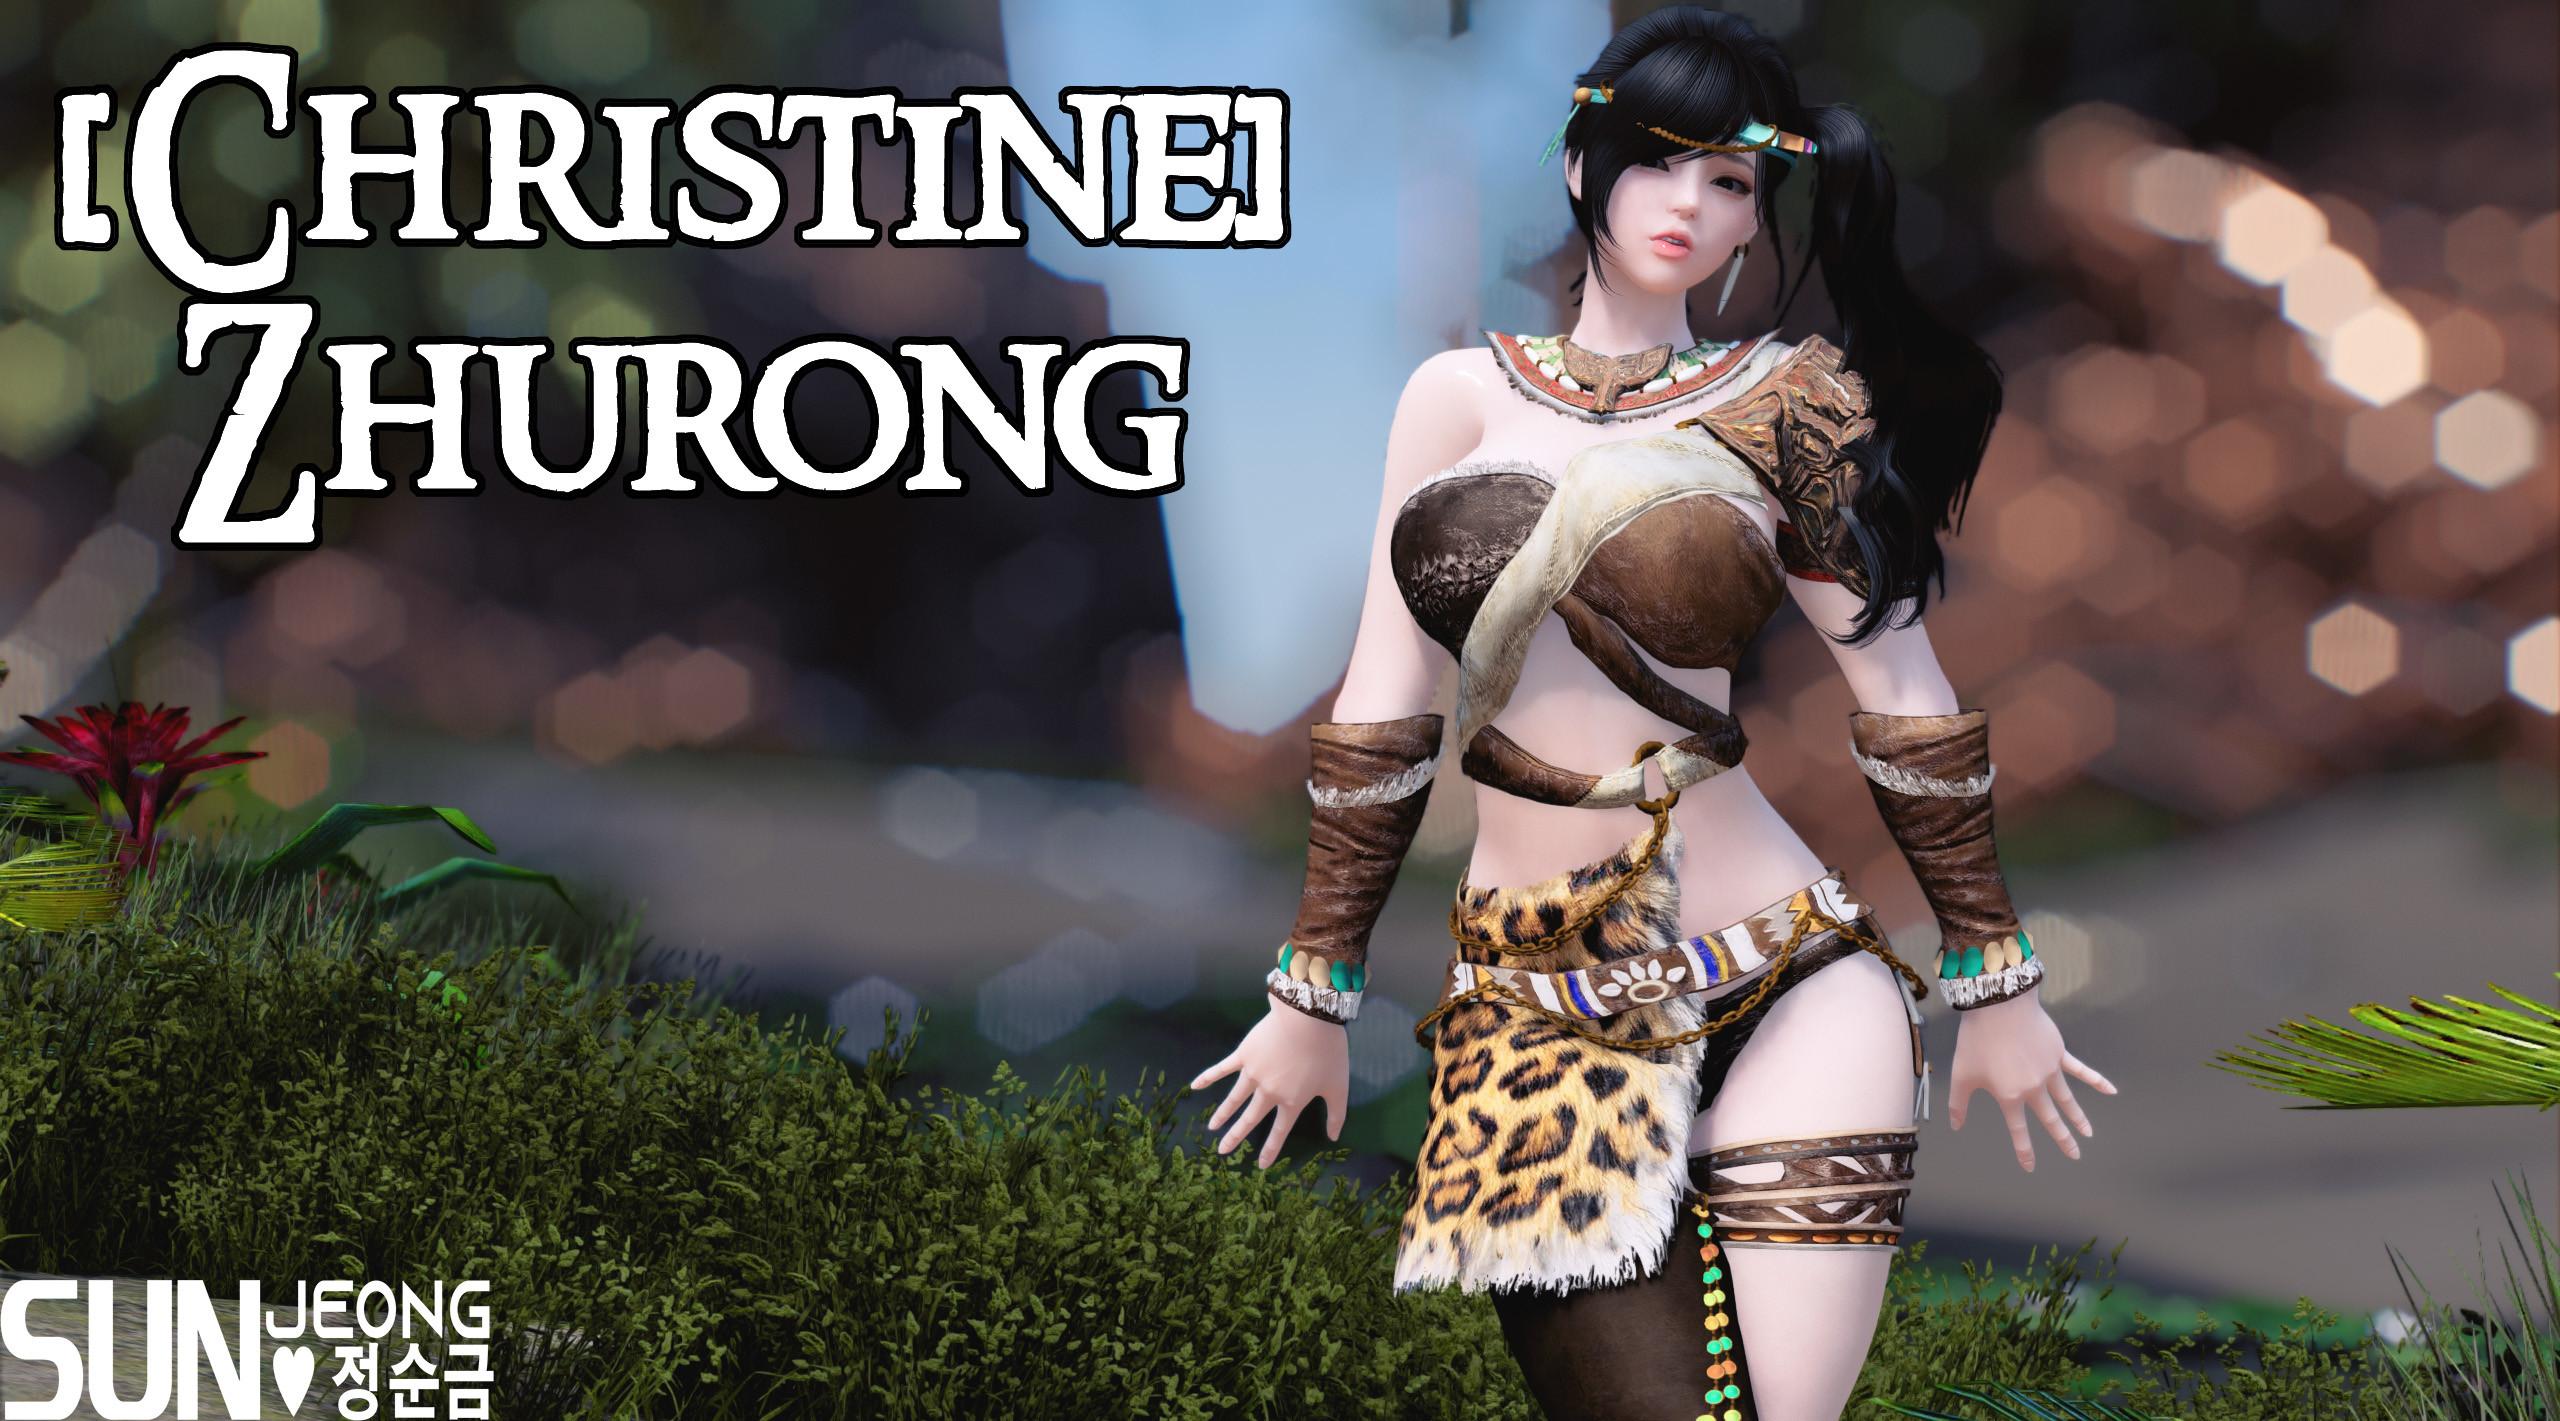 [Christine] Zhurong